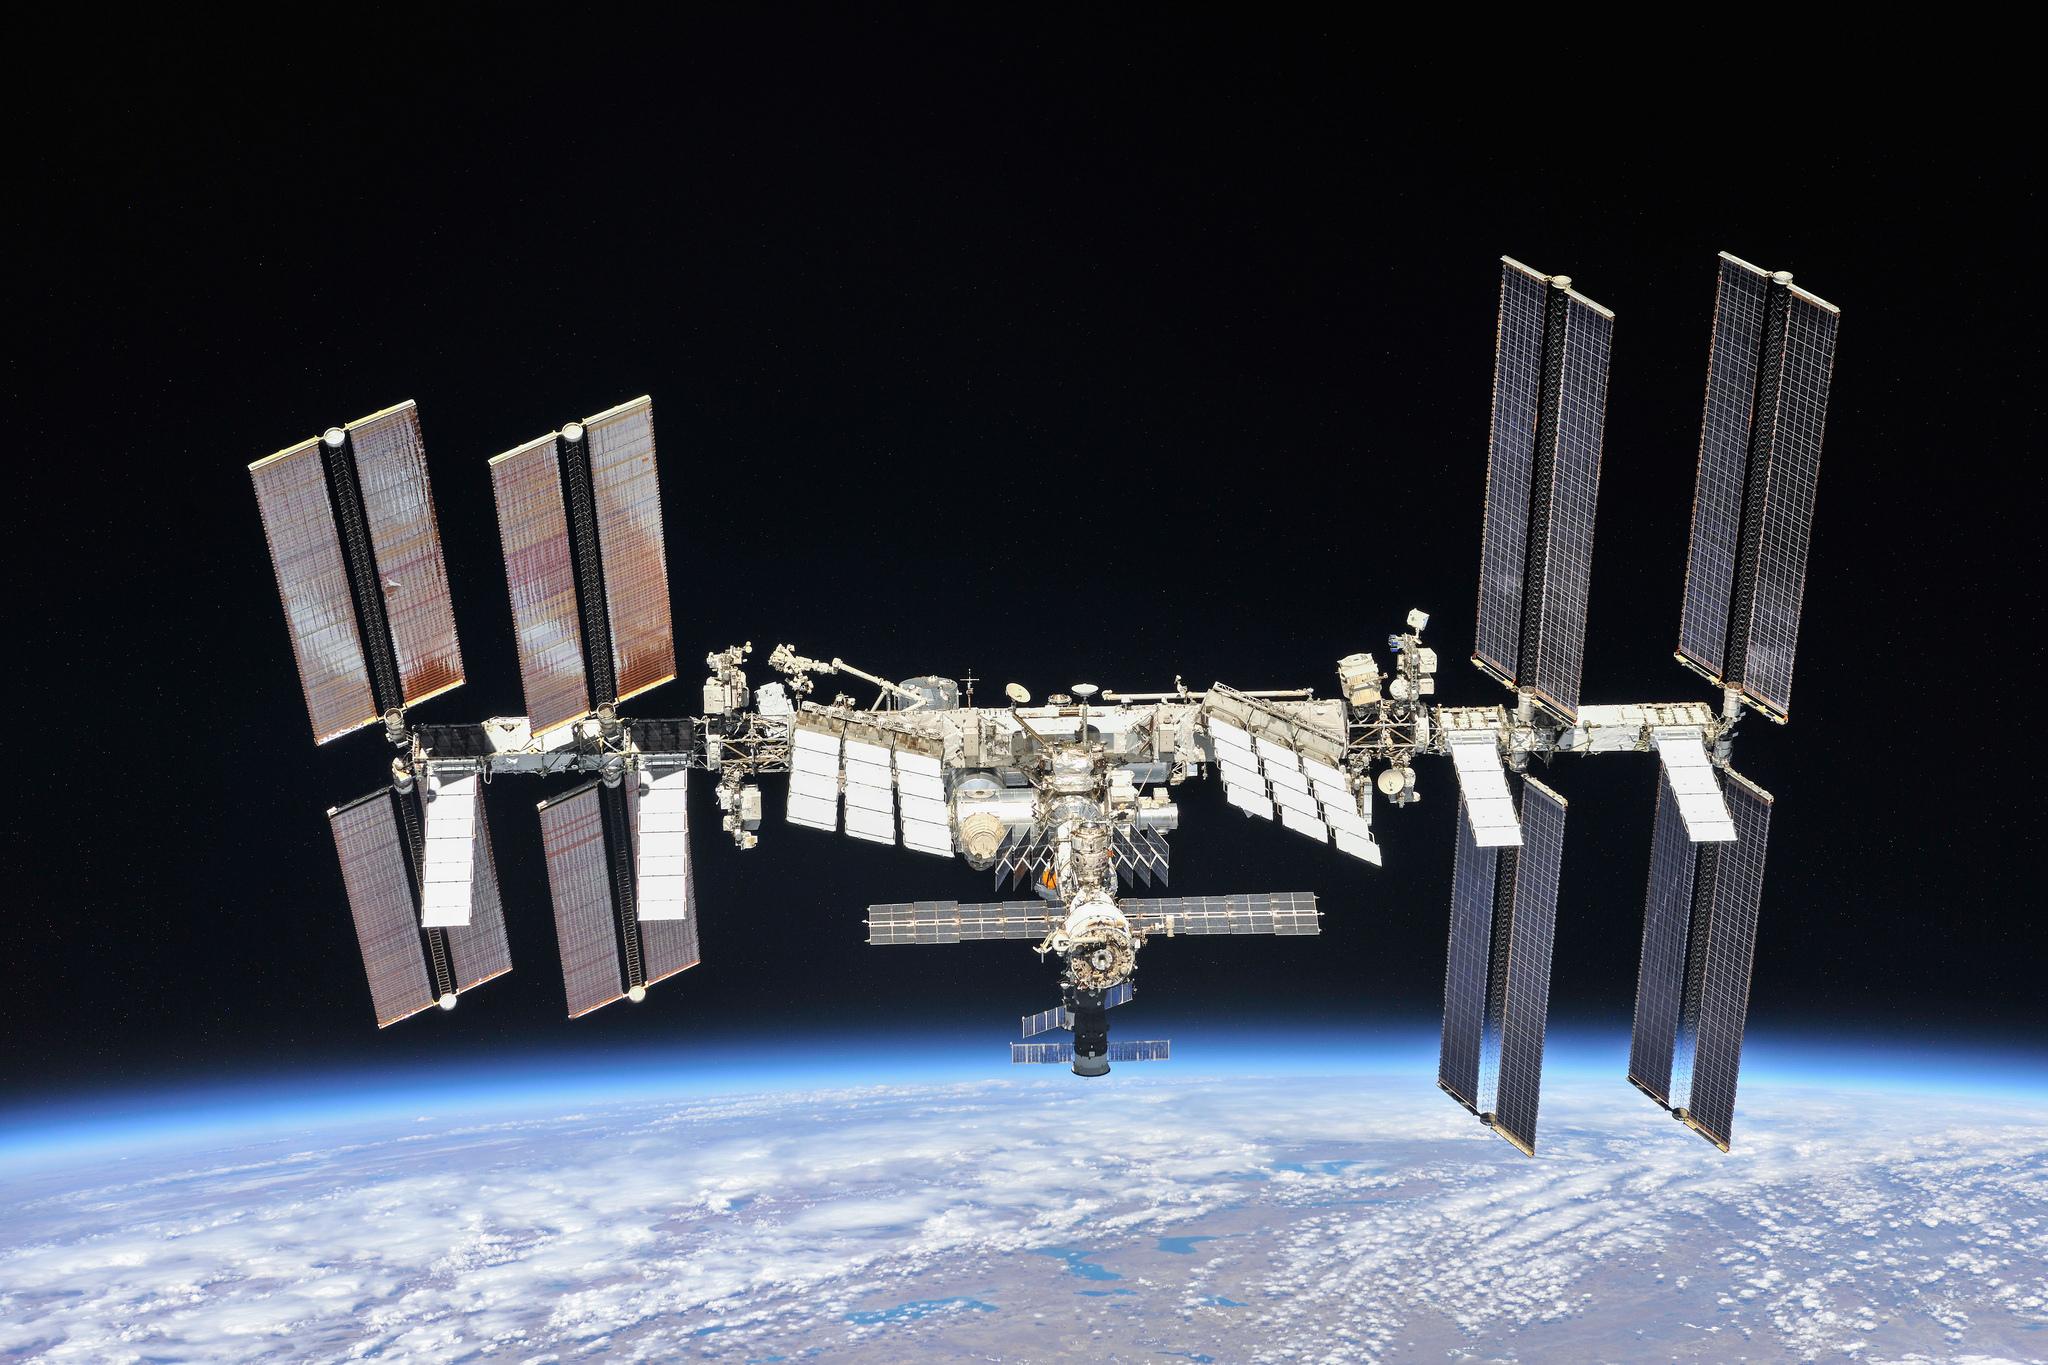 International Space Station in low-Earth orbit